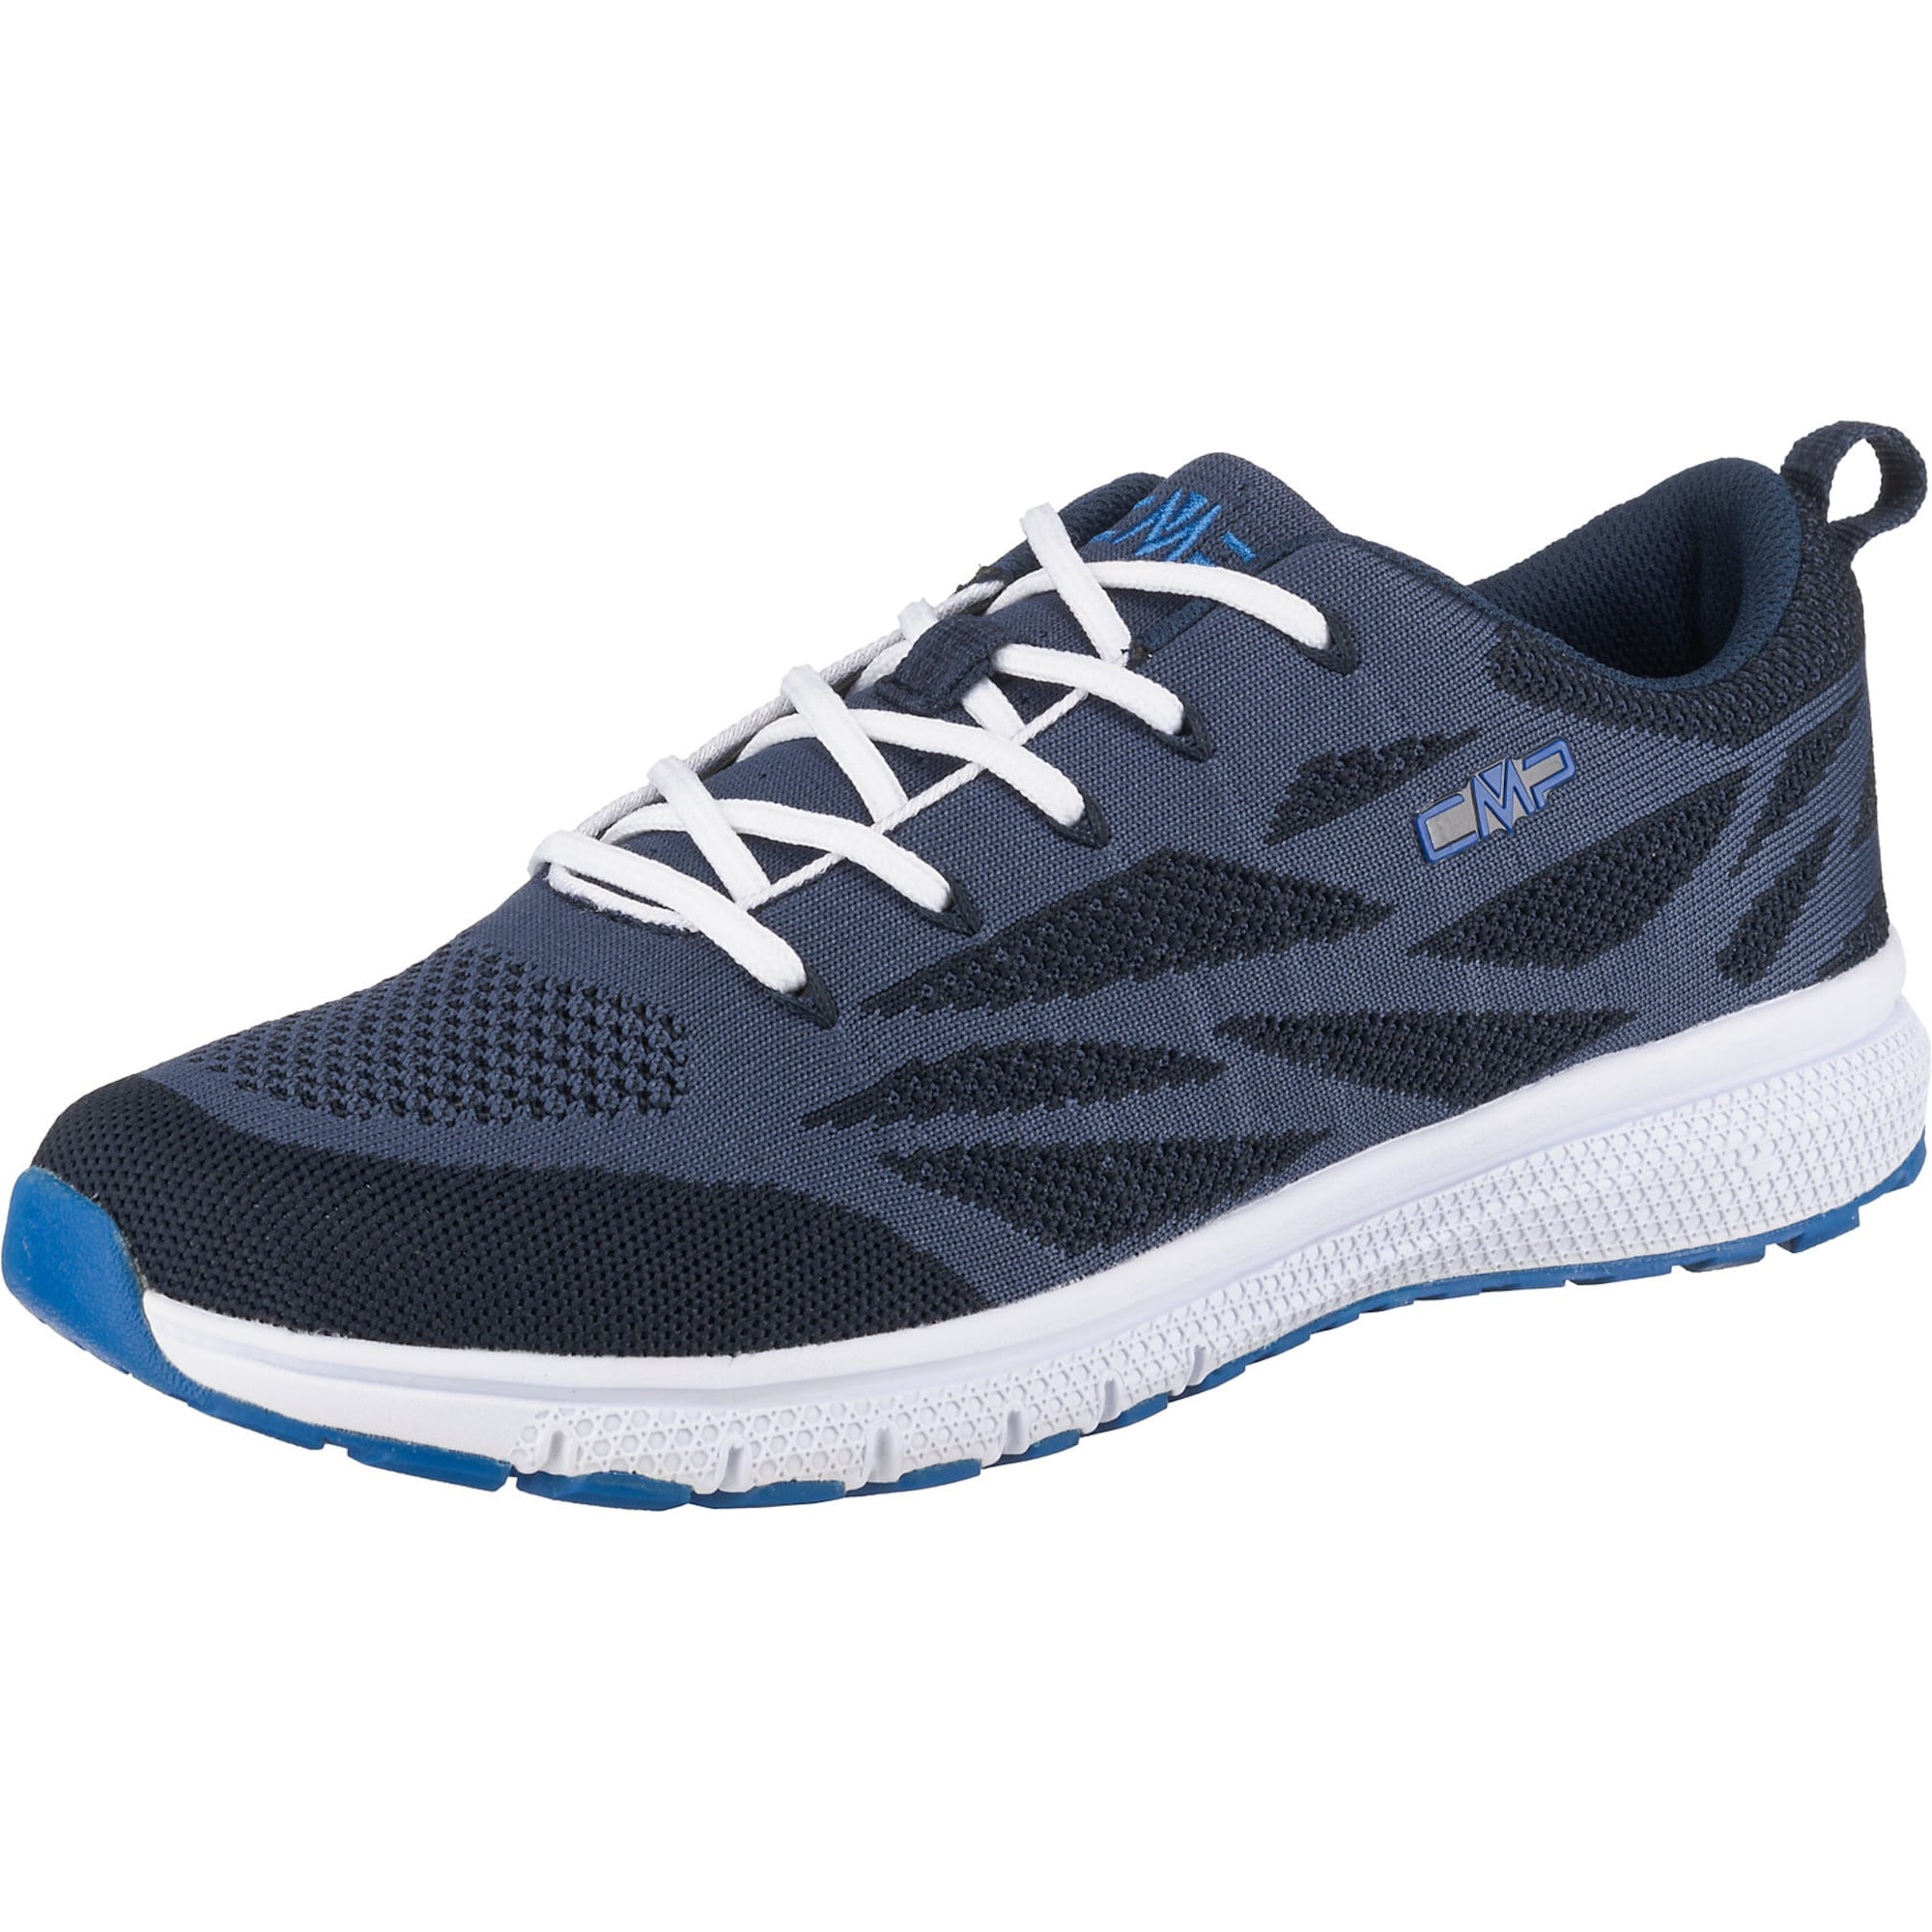 Fitnessschuhe 'Chamaeleontis Foam 2.0' | Schuhe > Sportschuhe > Fitnessschuhe | CMP